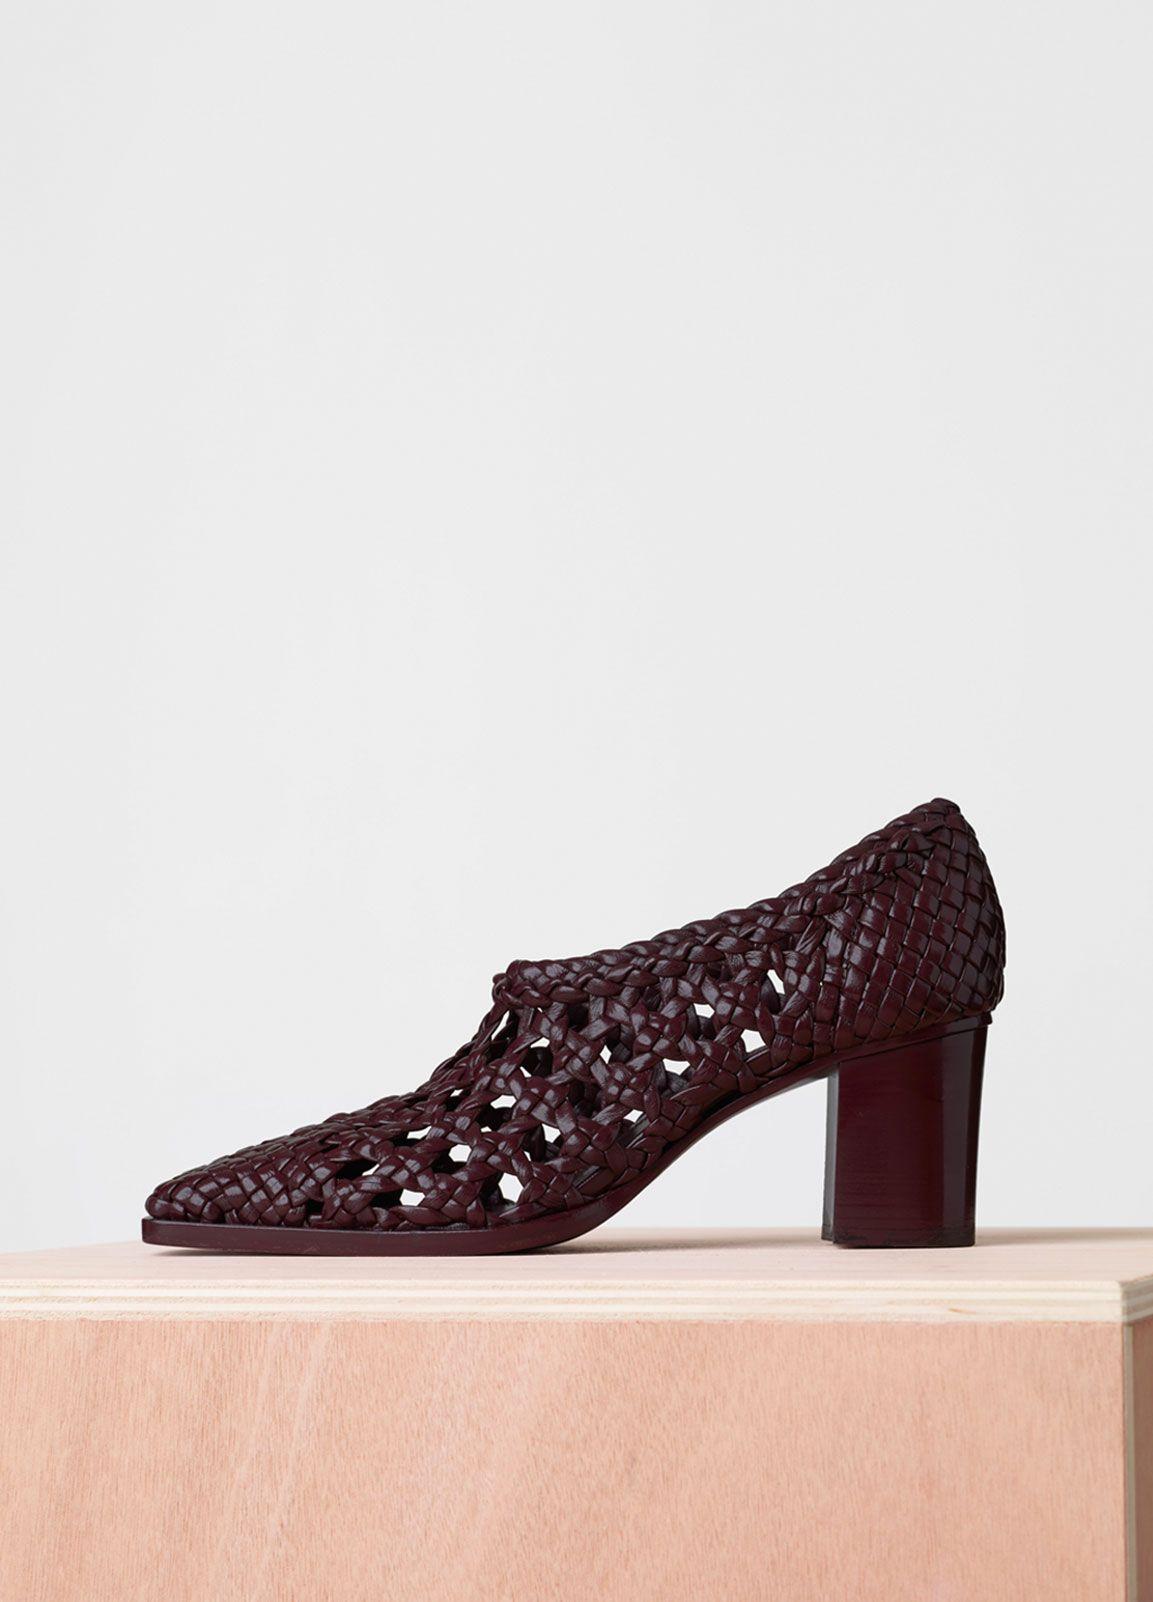 Chaussures Womens En Vente Dans La Sortie, Rouge, Cuir, 2017, 38 Celine